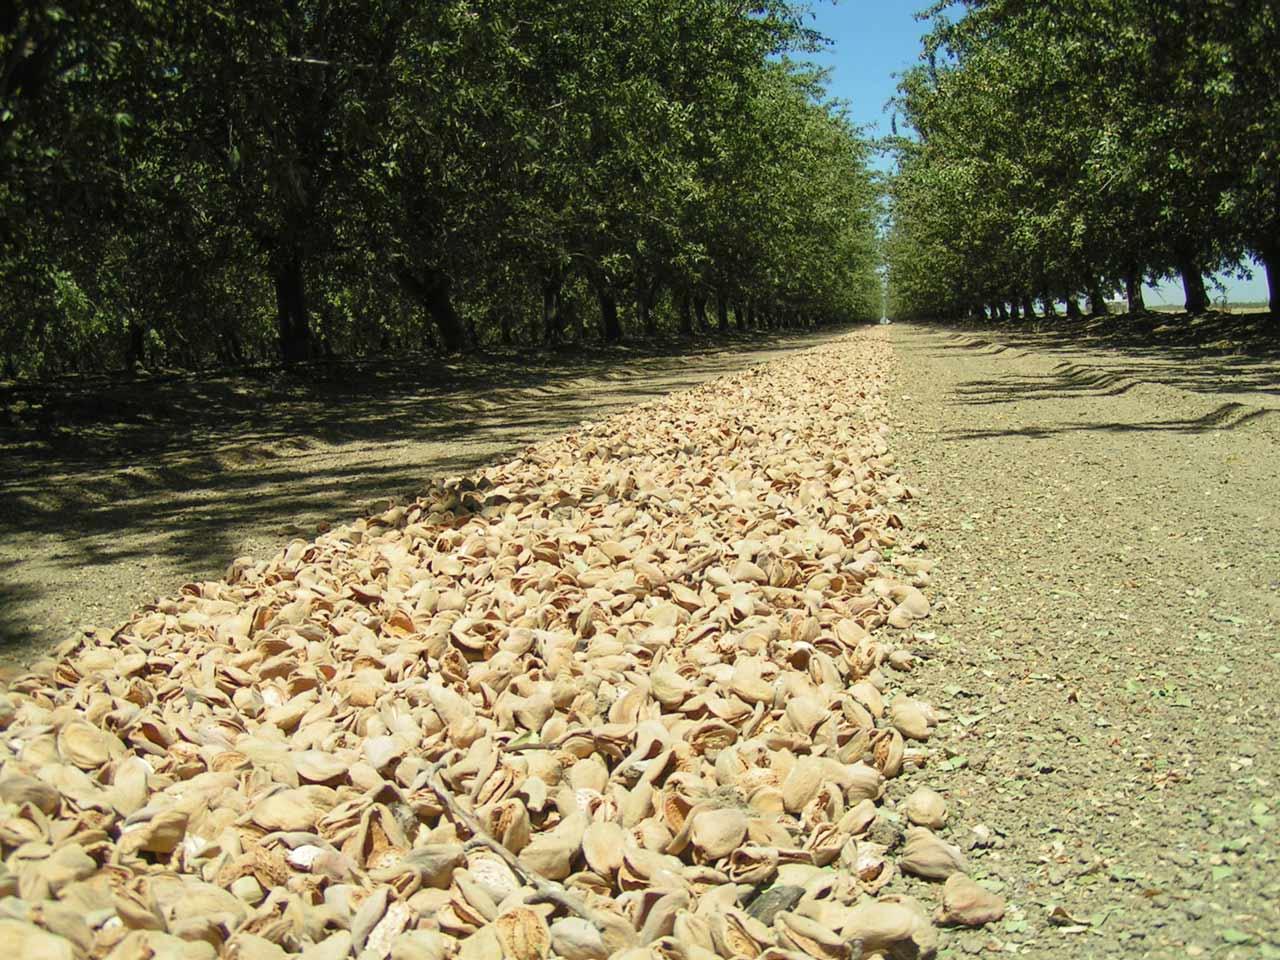 almonds on the ground.jpg